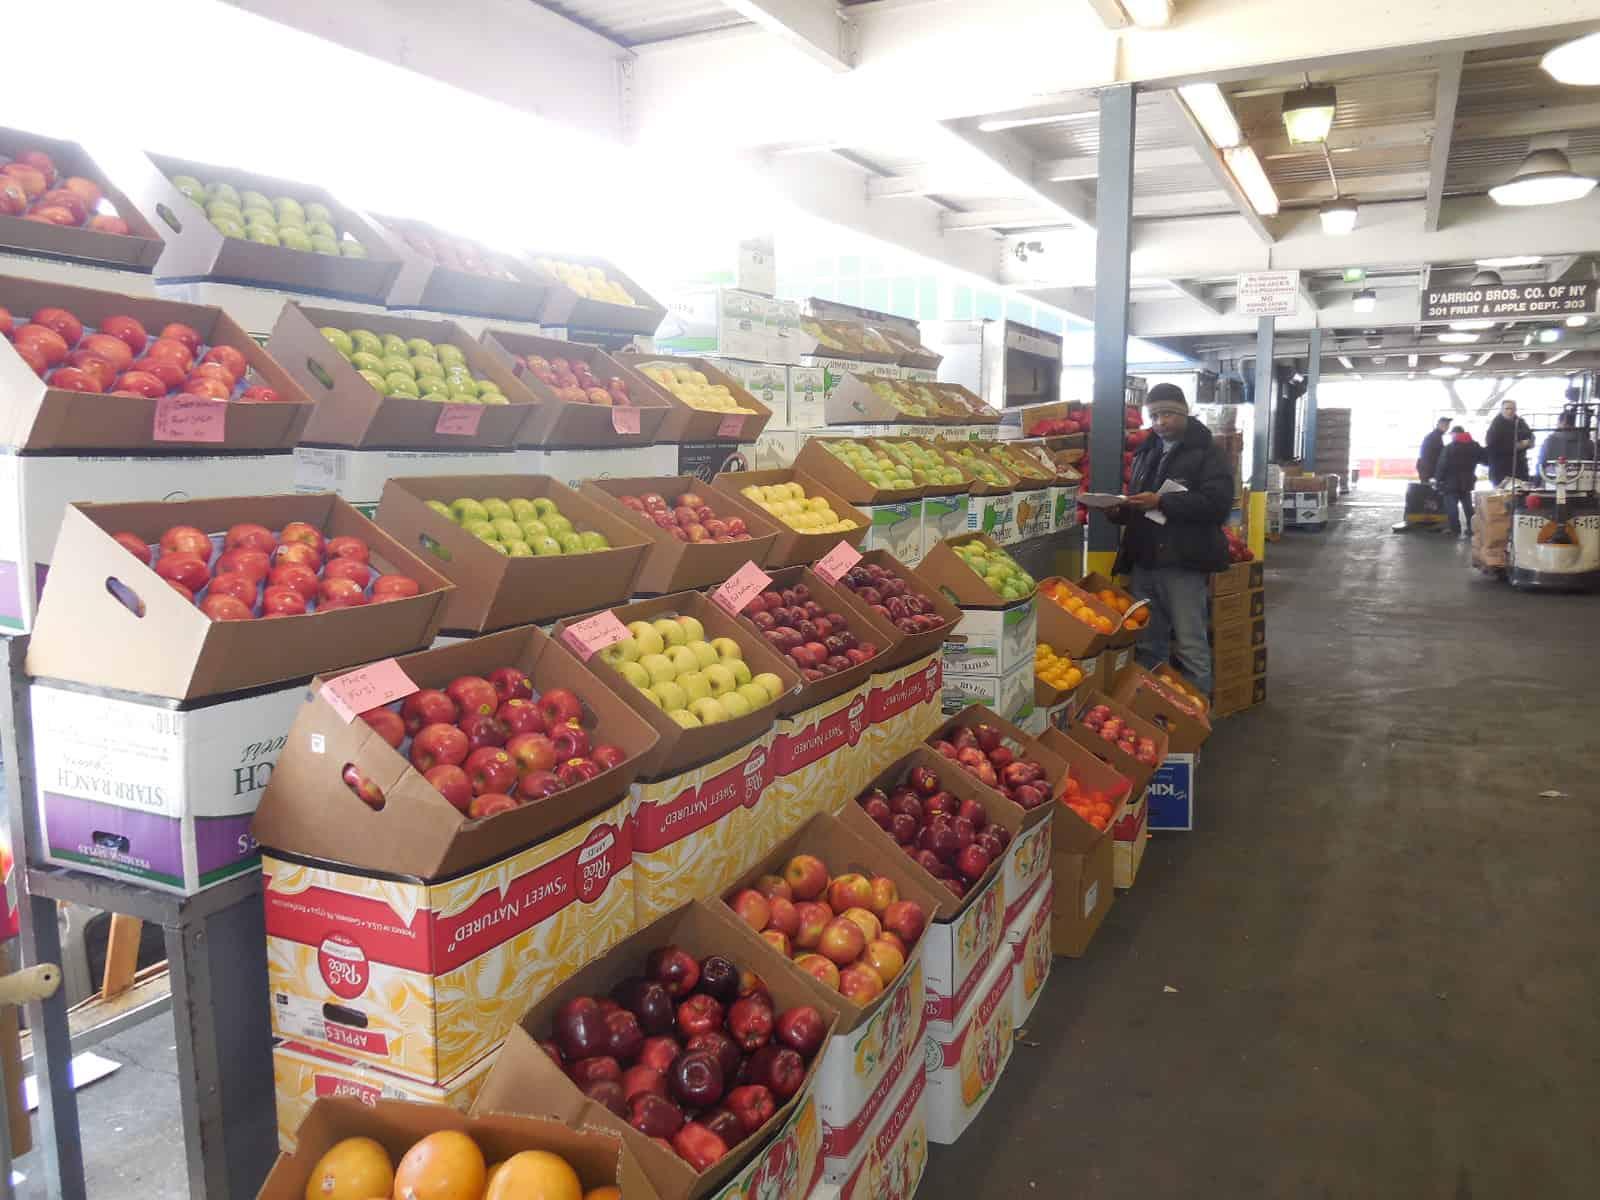 Hunt Points' D'Arrigo Acquires Facility off of the Wholesale Market